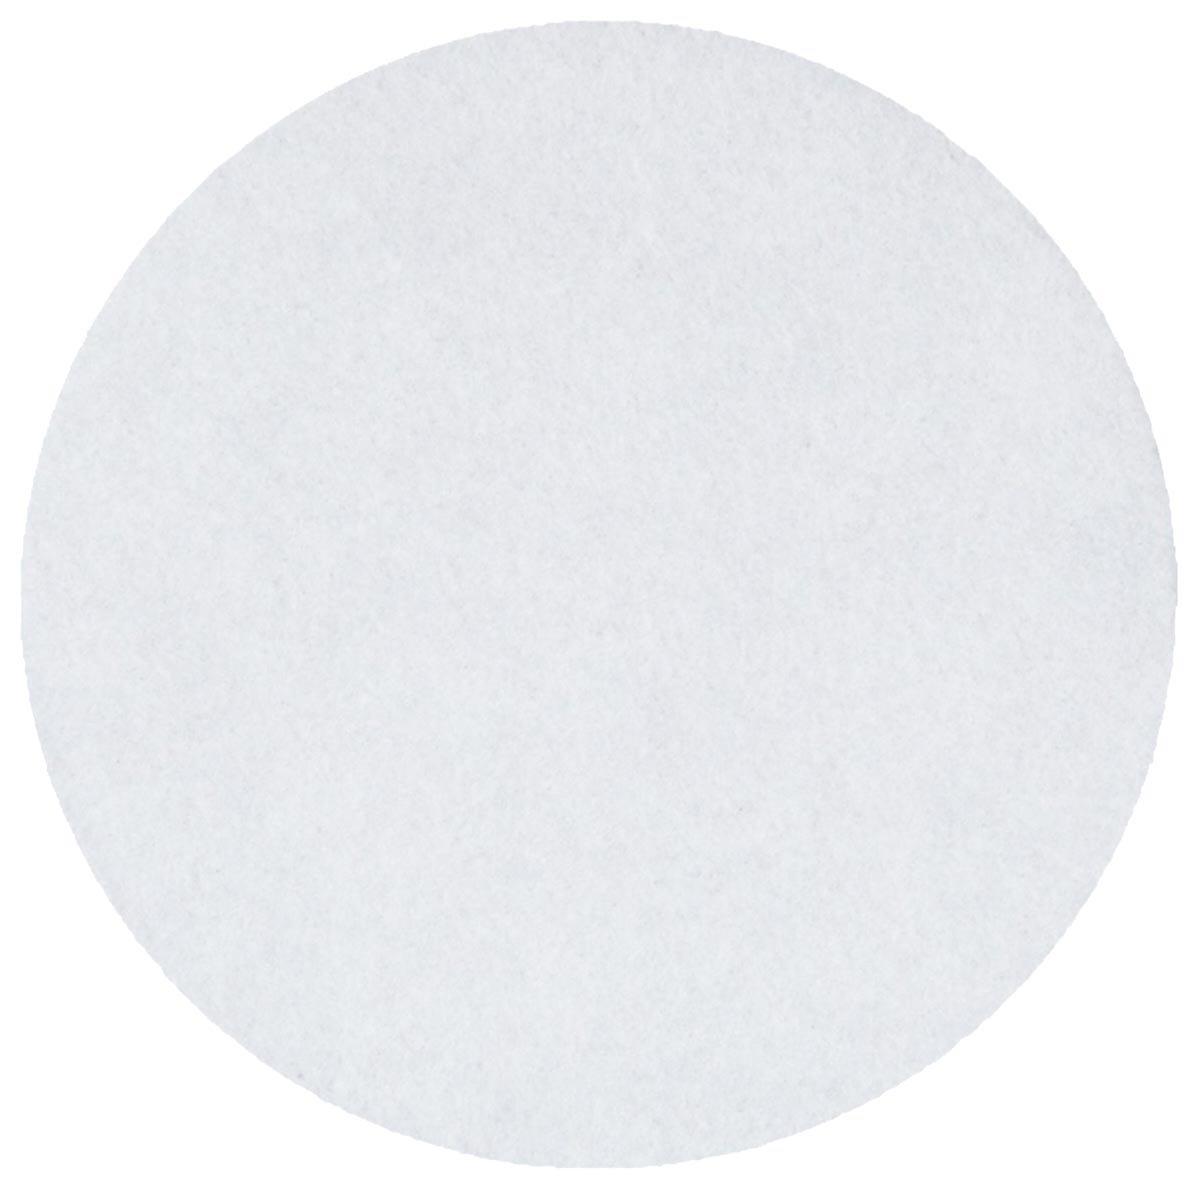 Whatman 10312611 Quantitative Filter Paper Circles, 2 Micron, Grade 602H, 125mm Diameter (Pack of 100) WHA-10312611